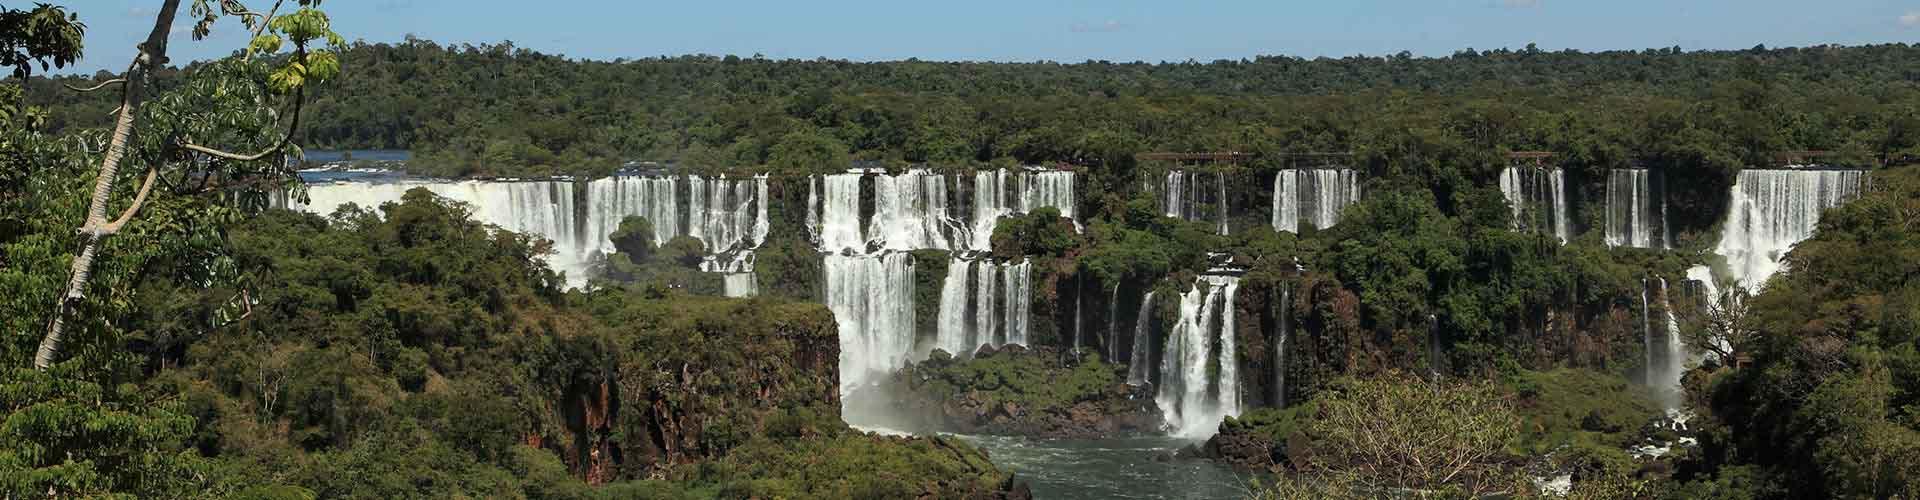 Puerto Iguazu - Alberghi a Puerto Iguazu. Mappe per Puerto Iguazu, Foto e  Recensioni per ogni Albergo a Puerto Iguazu.